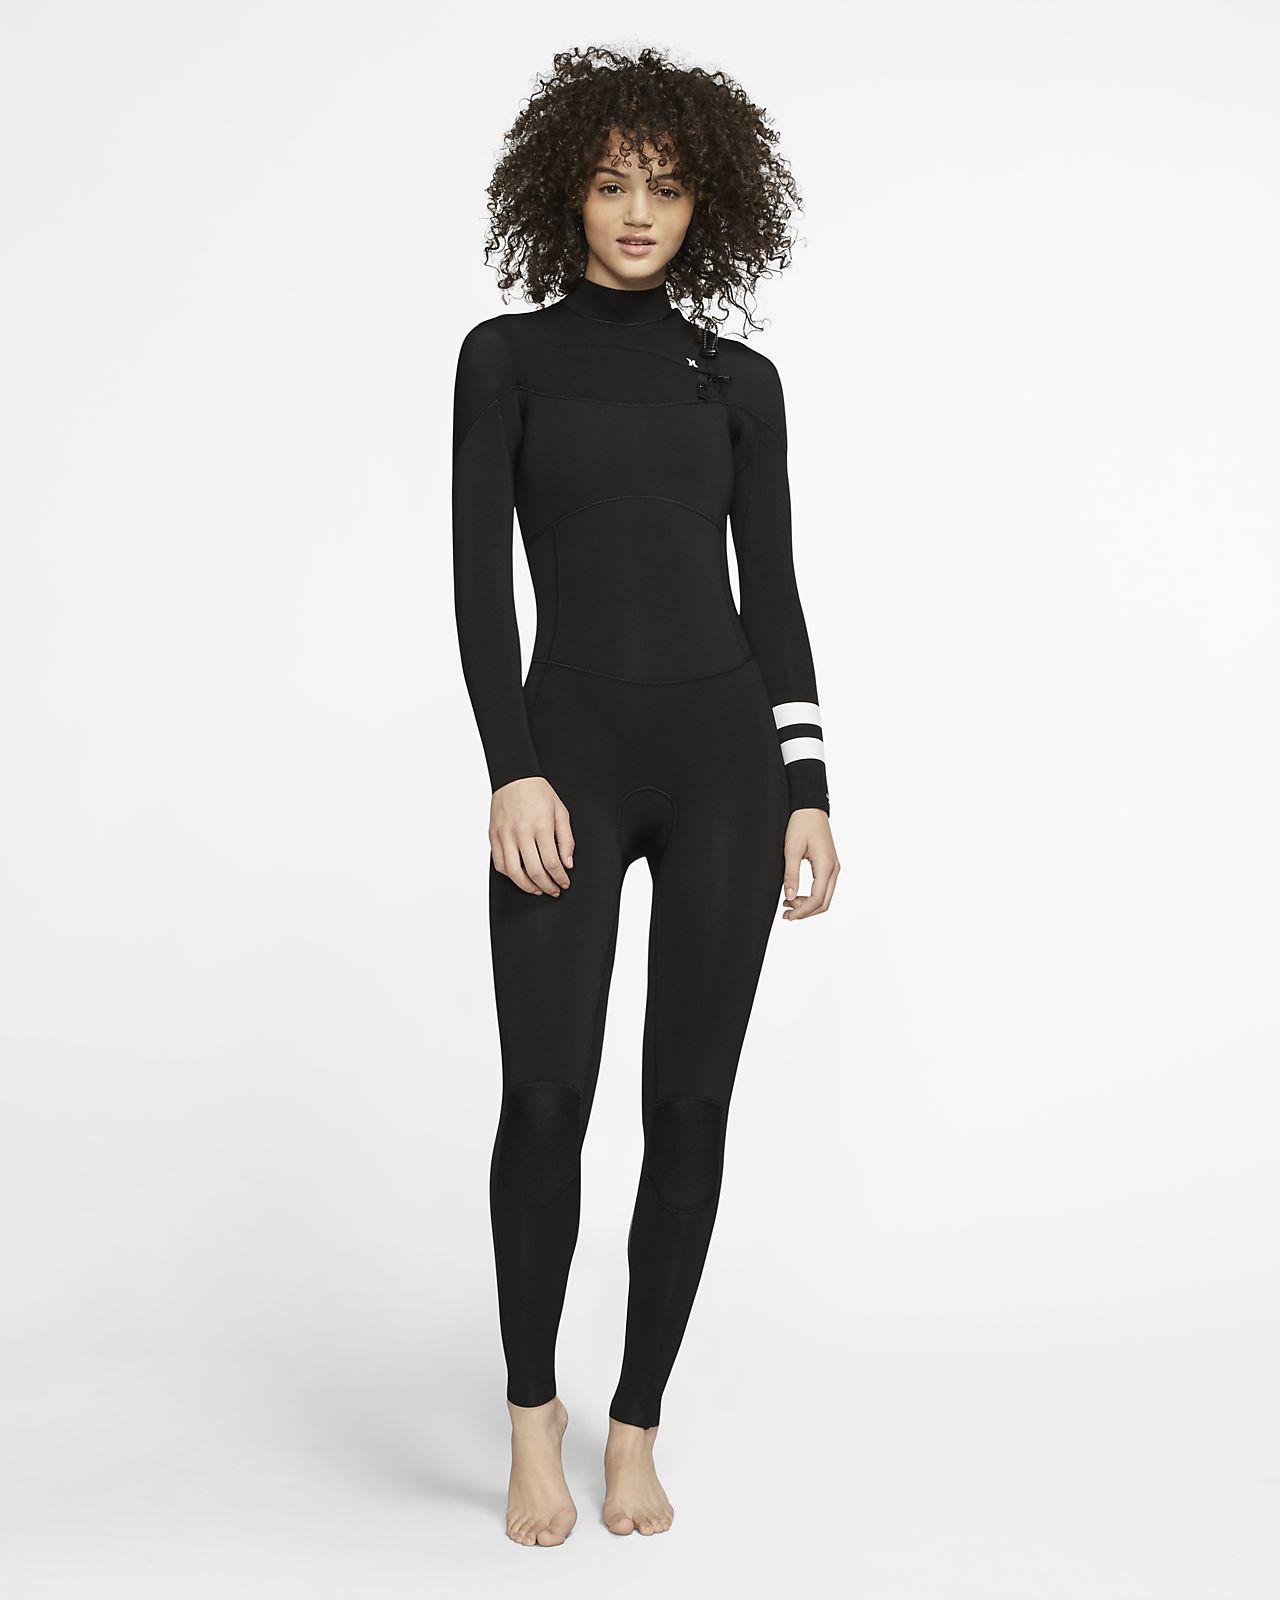 Hurley Advantage Plus 4/3mm Fullsuit Damen-Neoprenanzug